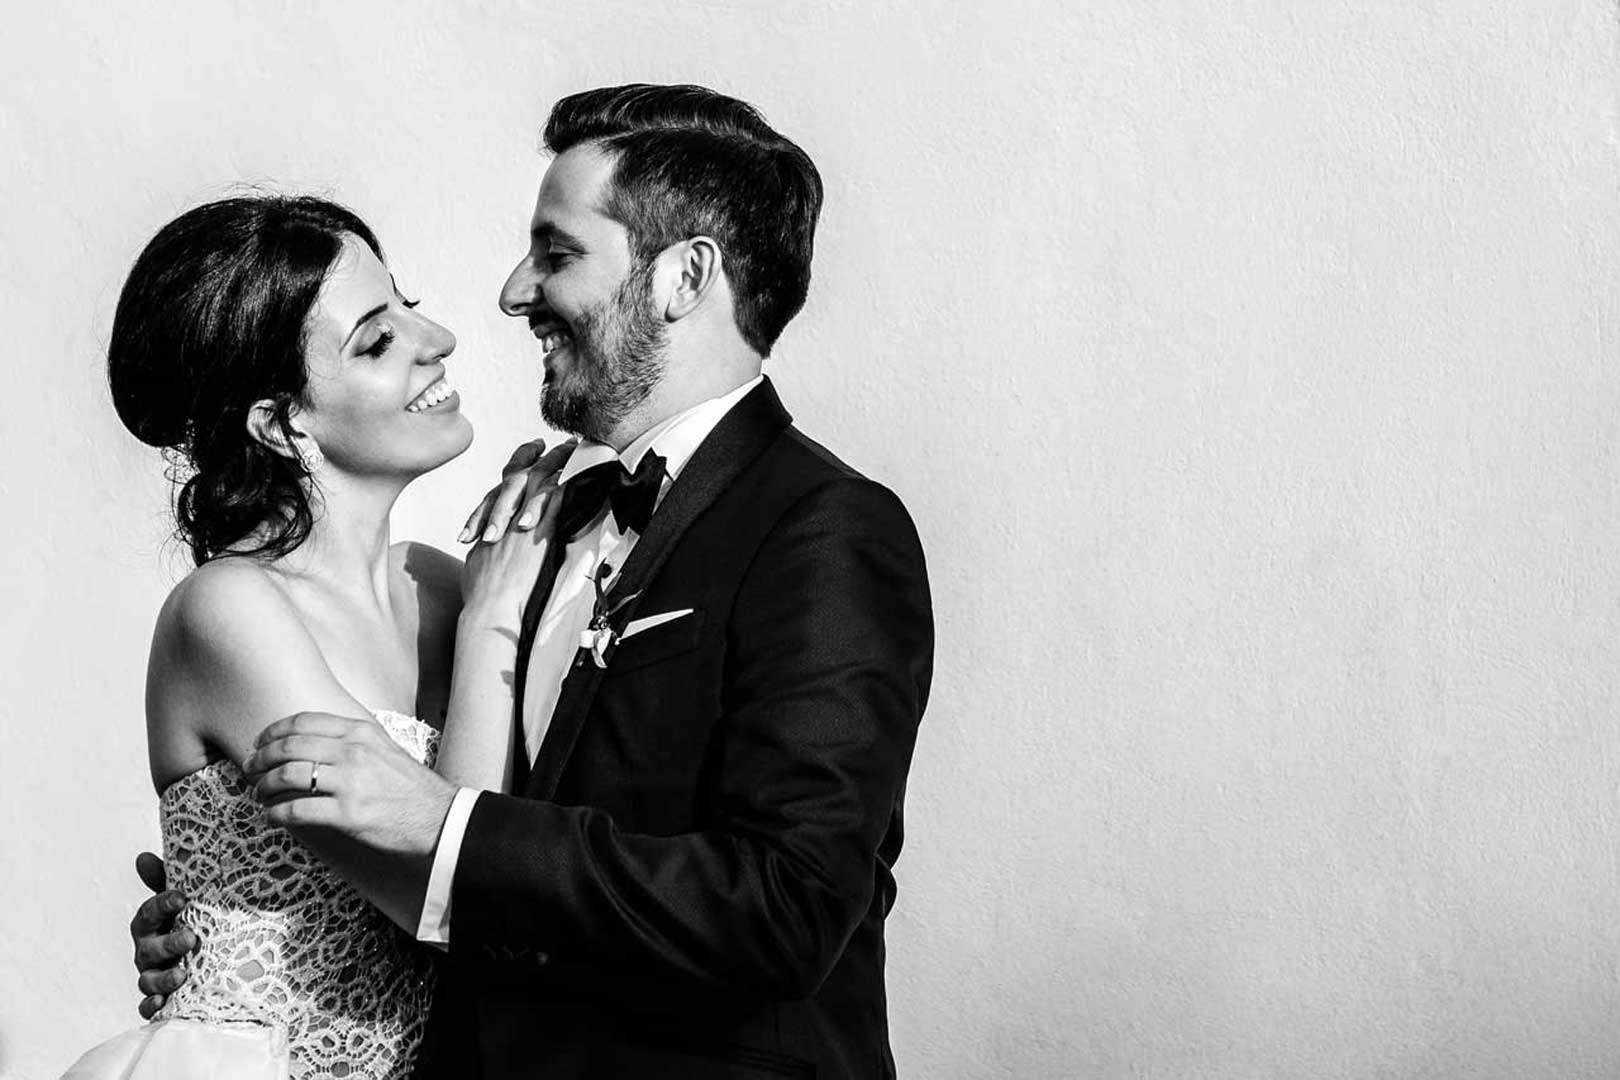 032-matrimonio-italiano-gianni-lepore-wedding-photographer